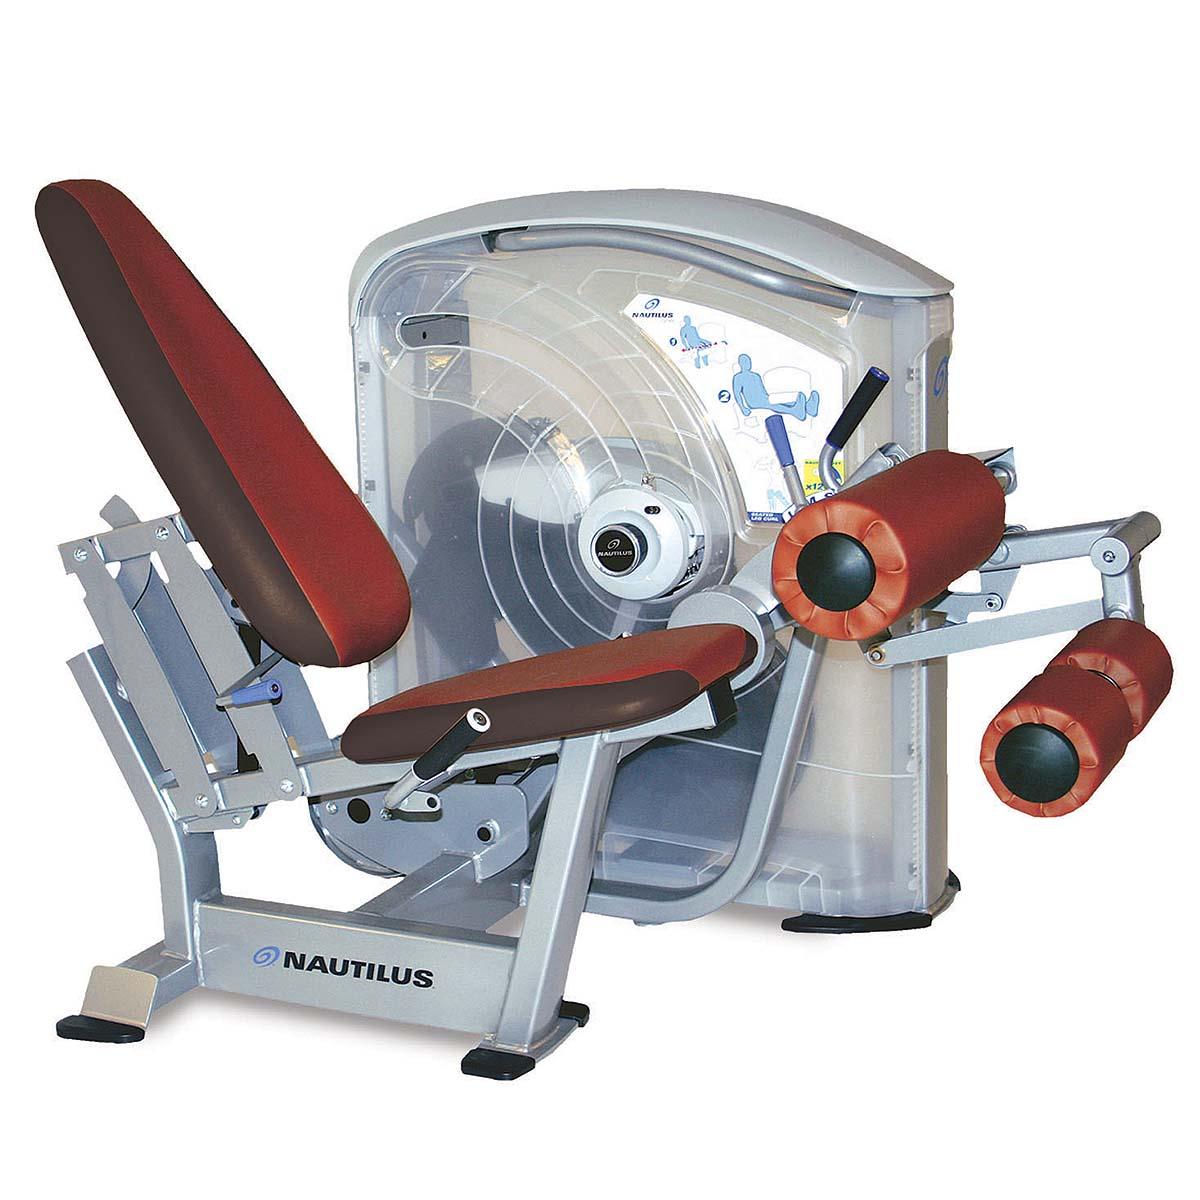 Richmond Strength Equipment - Nautilus One Series - Lifestyle Equipment